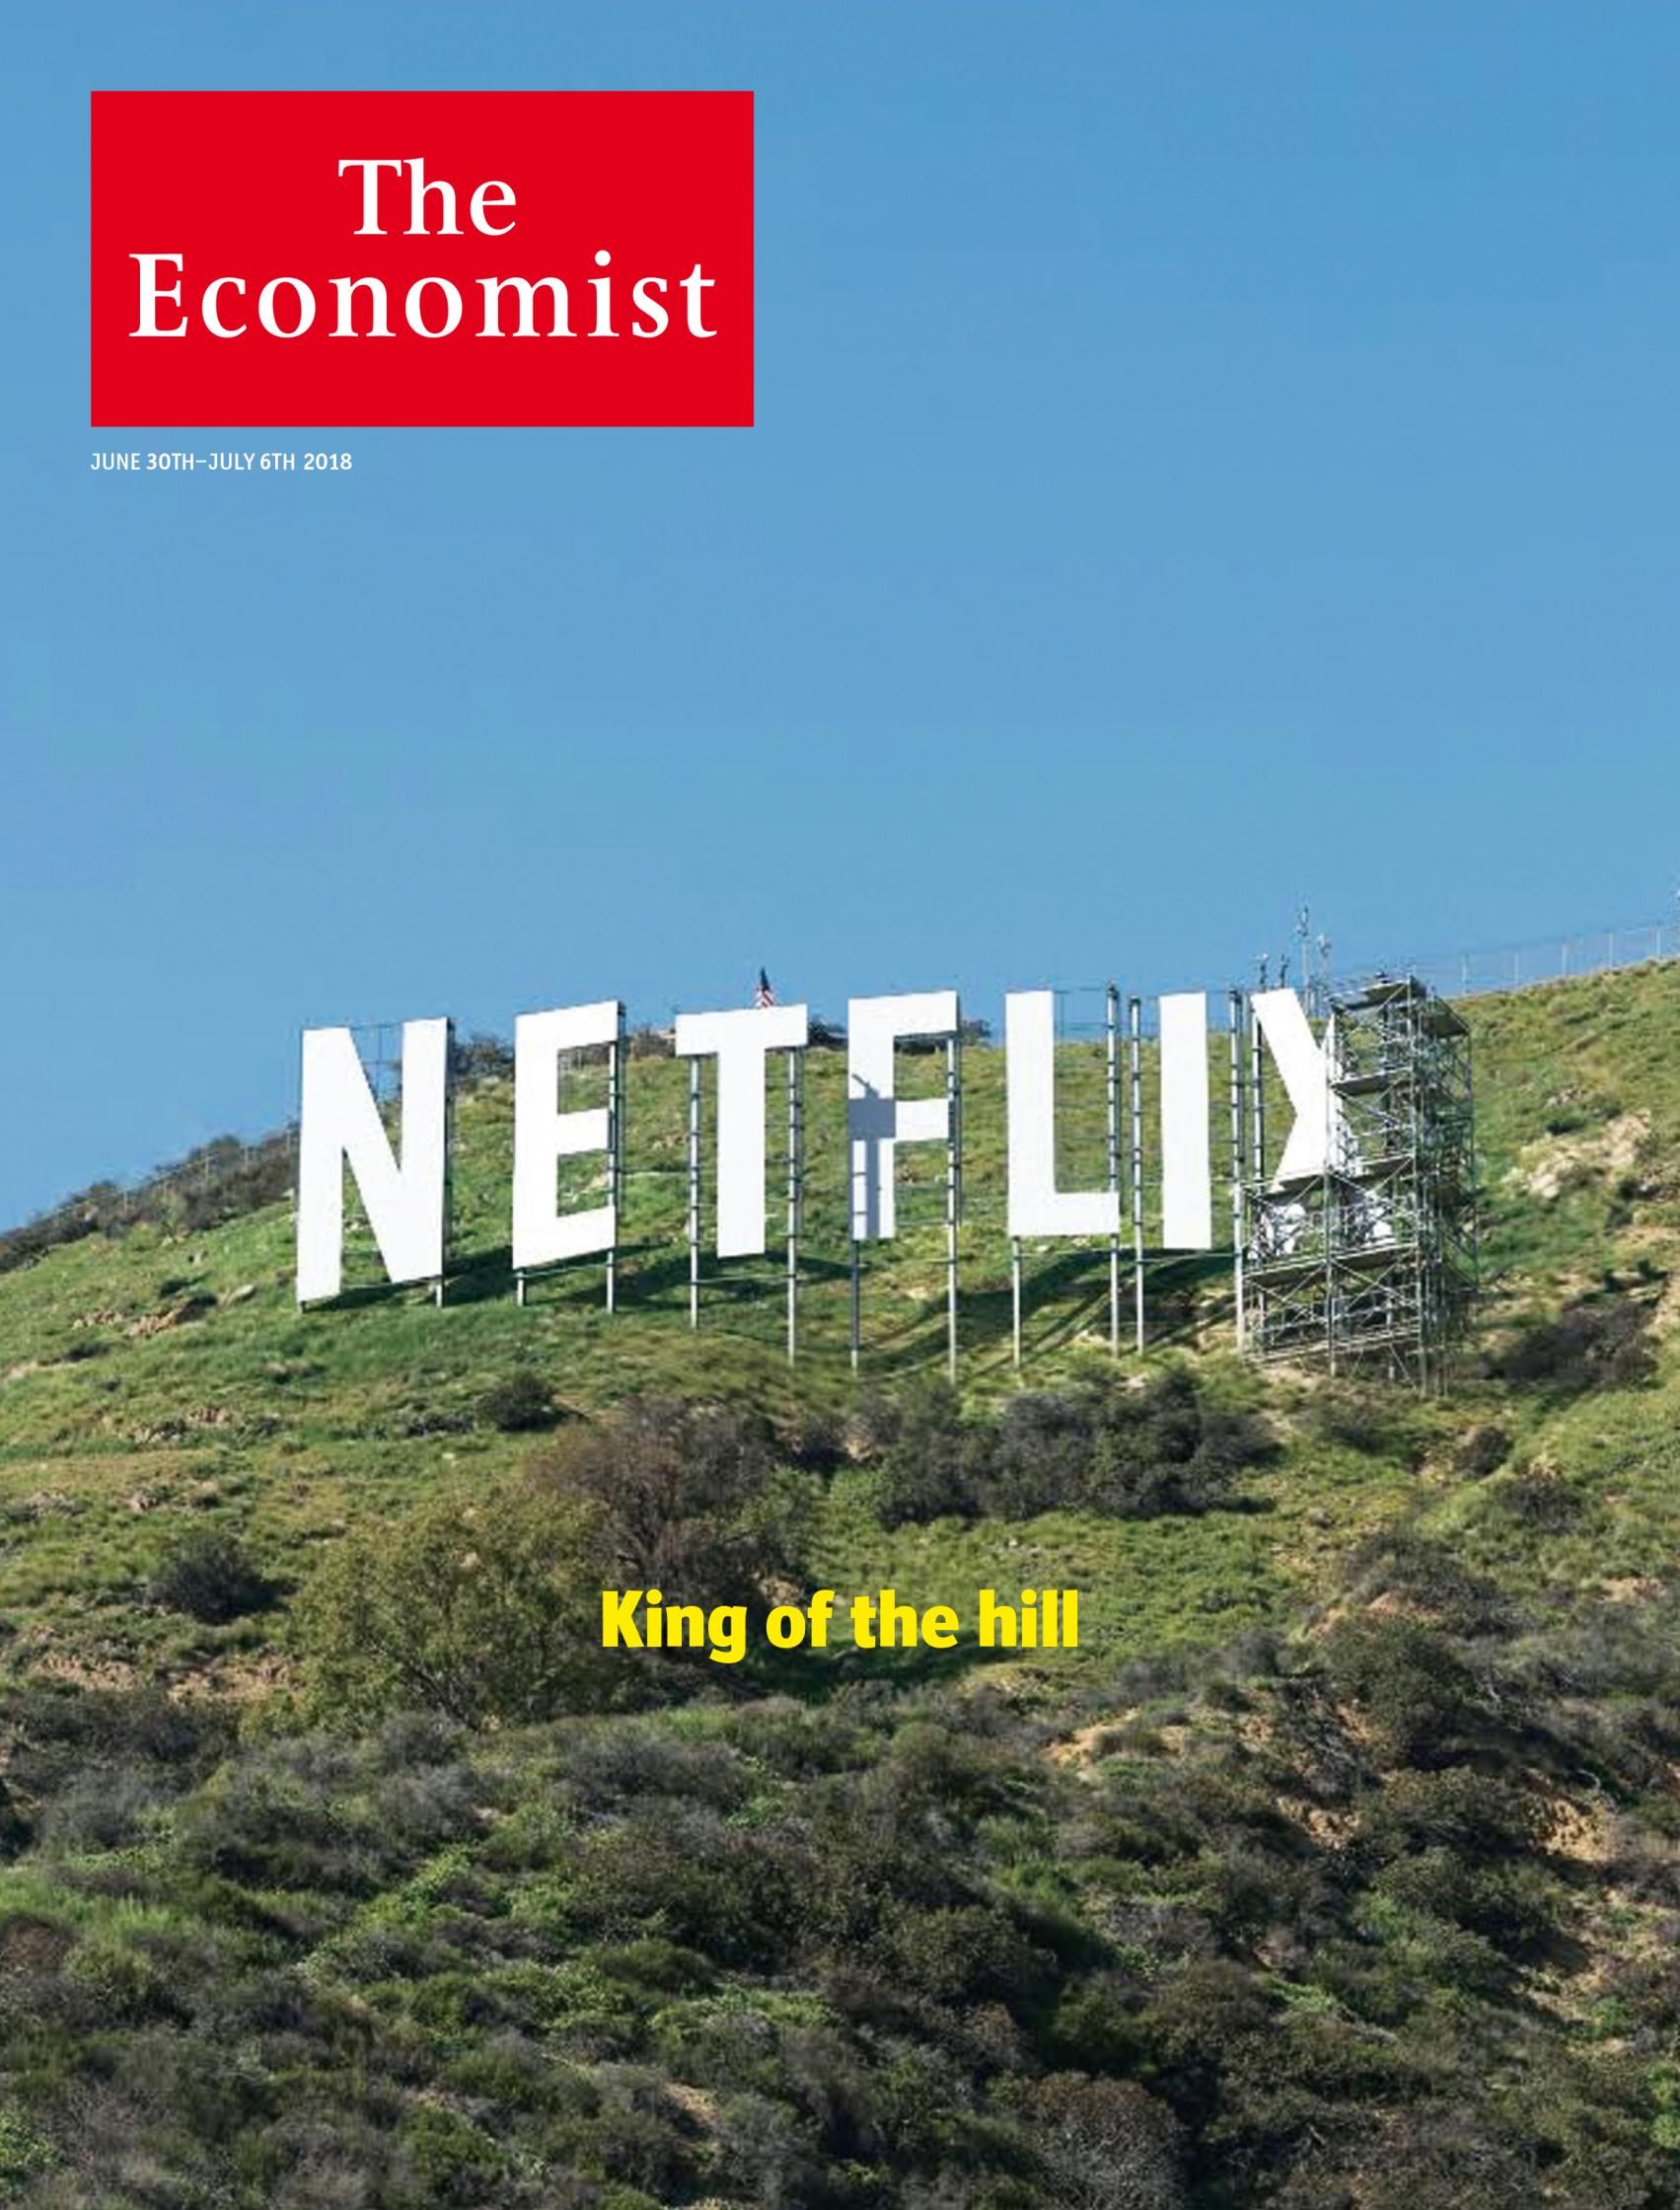 Economist_Netflix.jpg